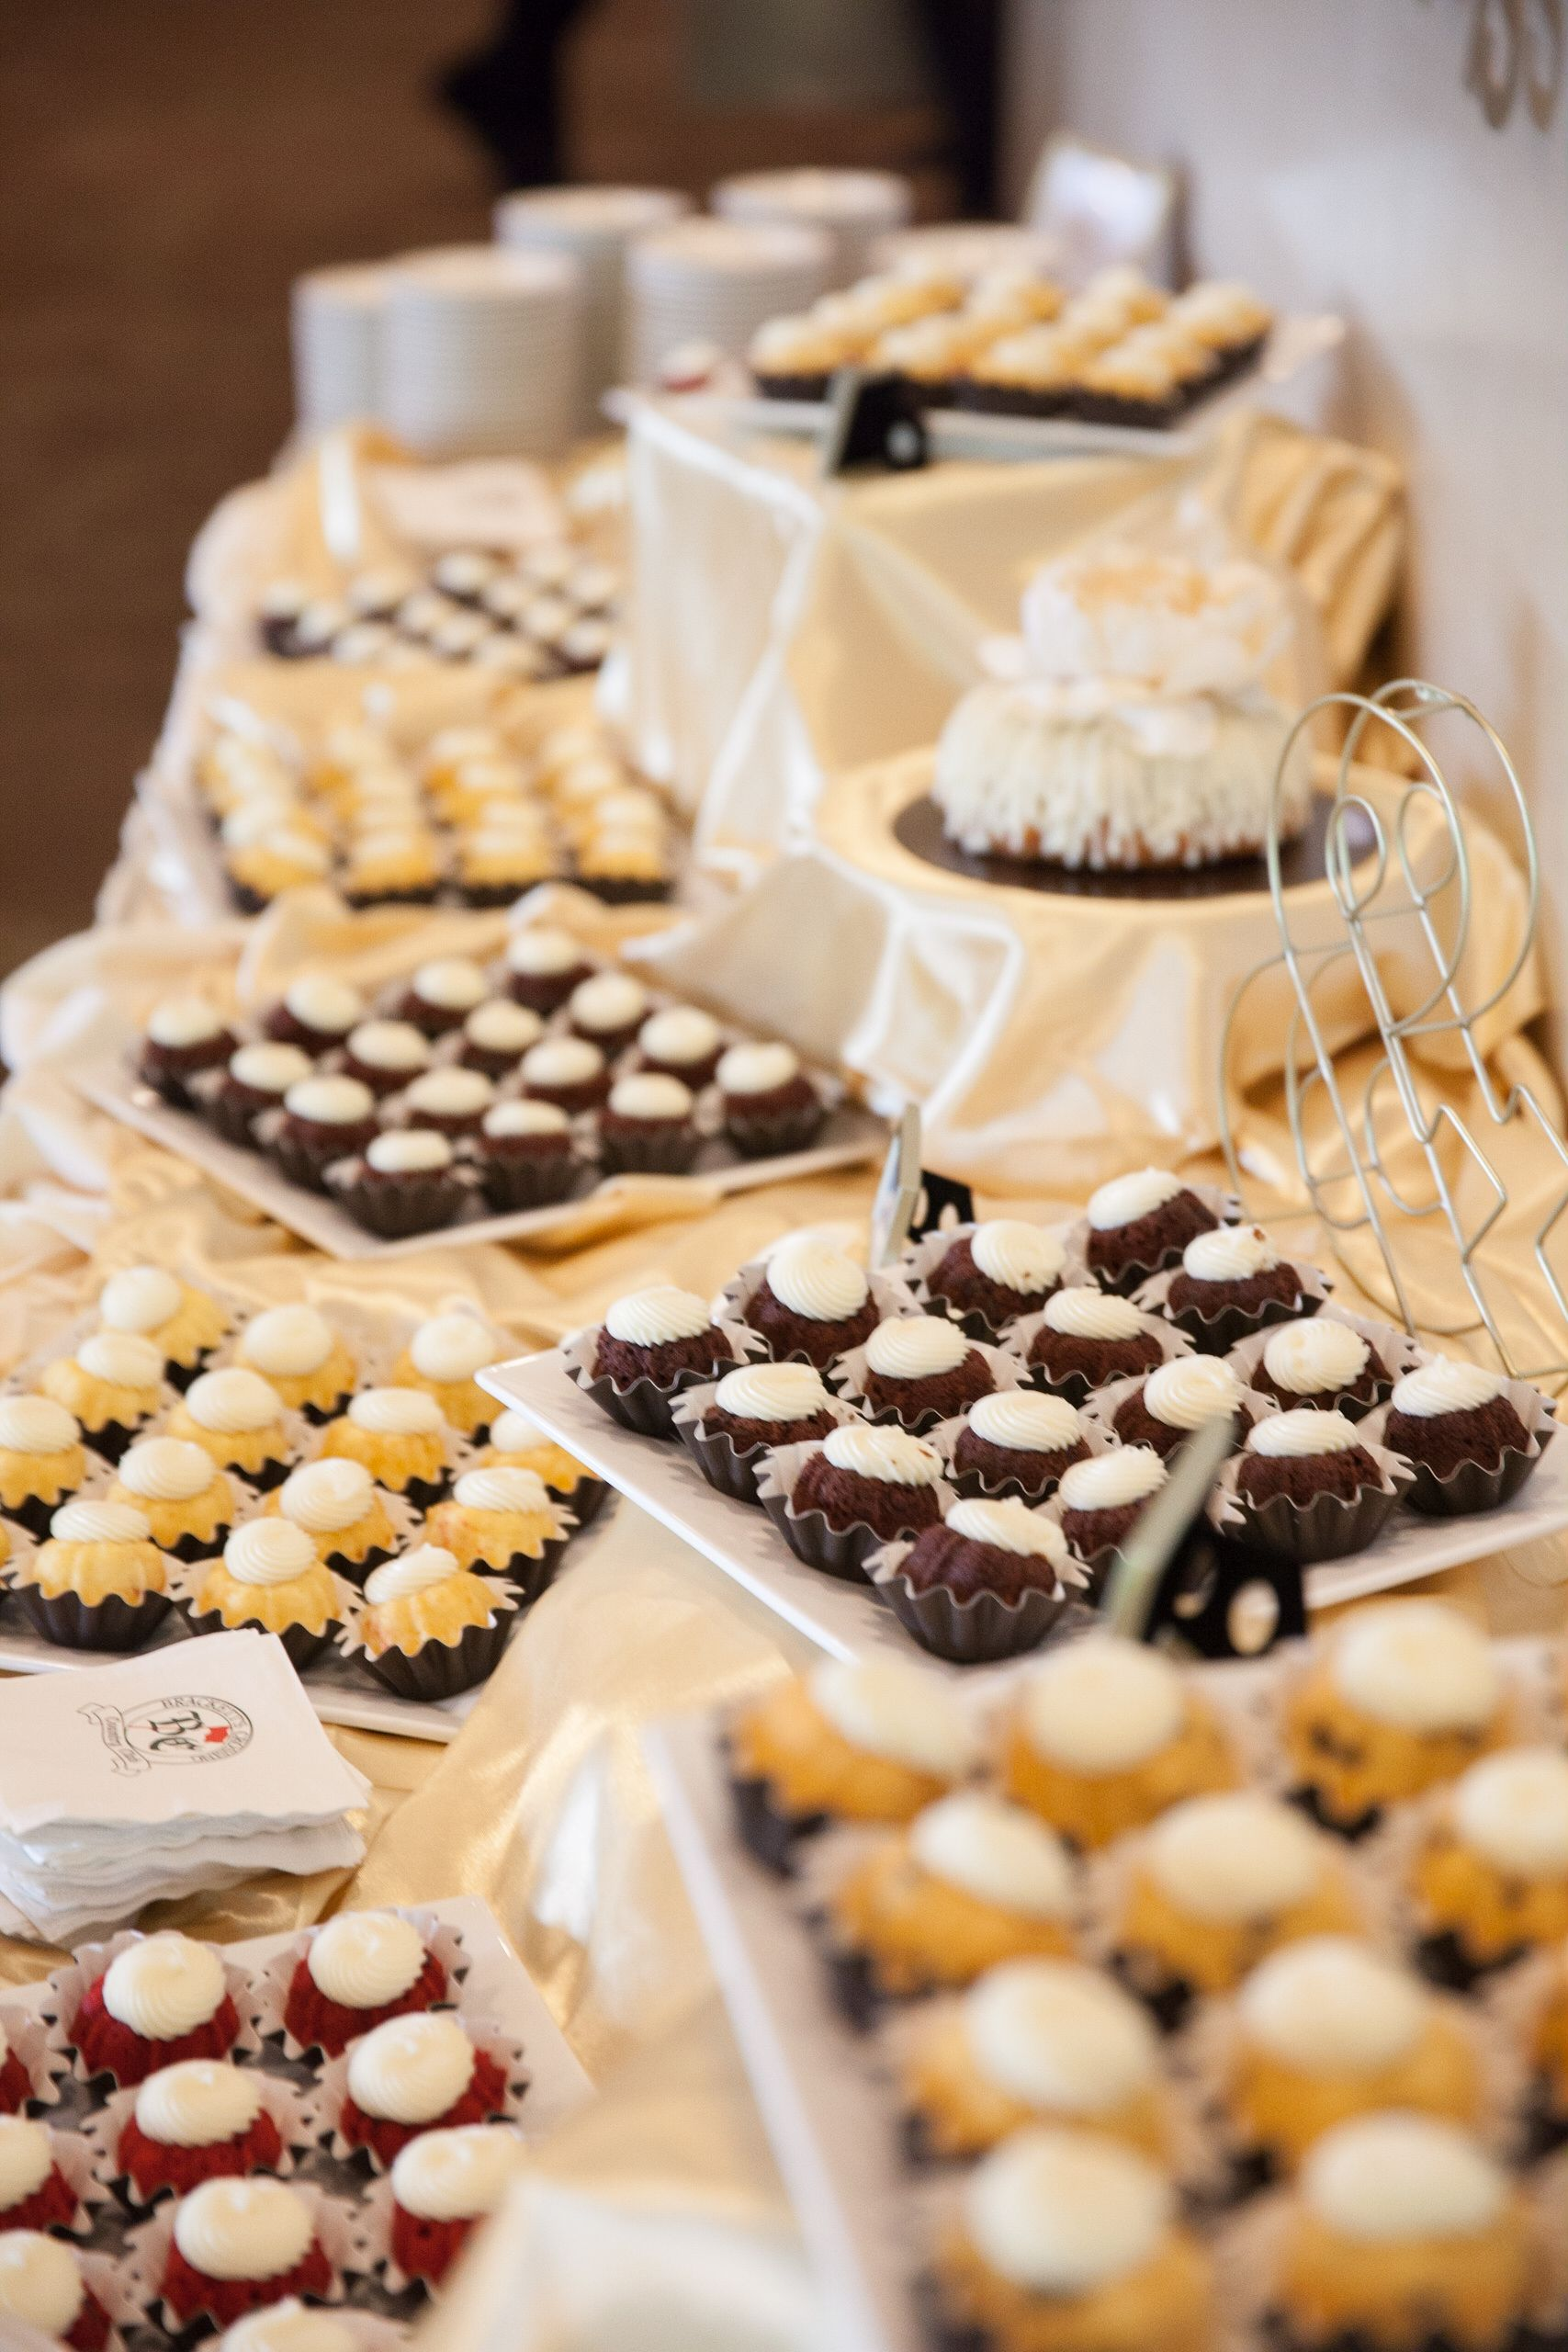 Bracketts crossing sweet treats desserts nothing